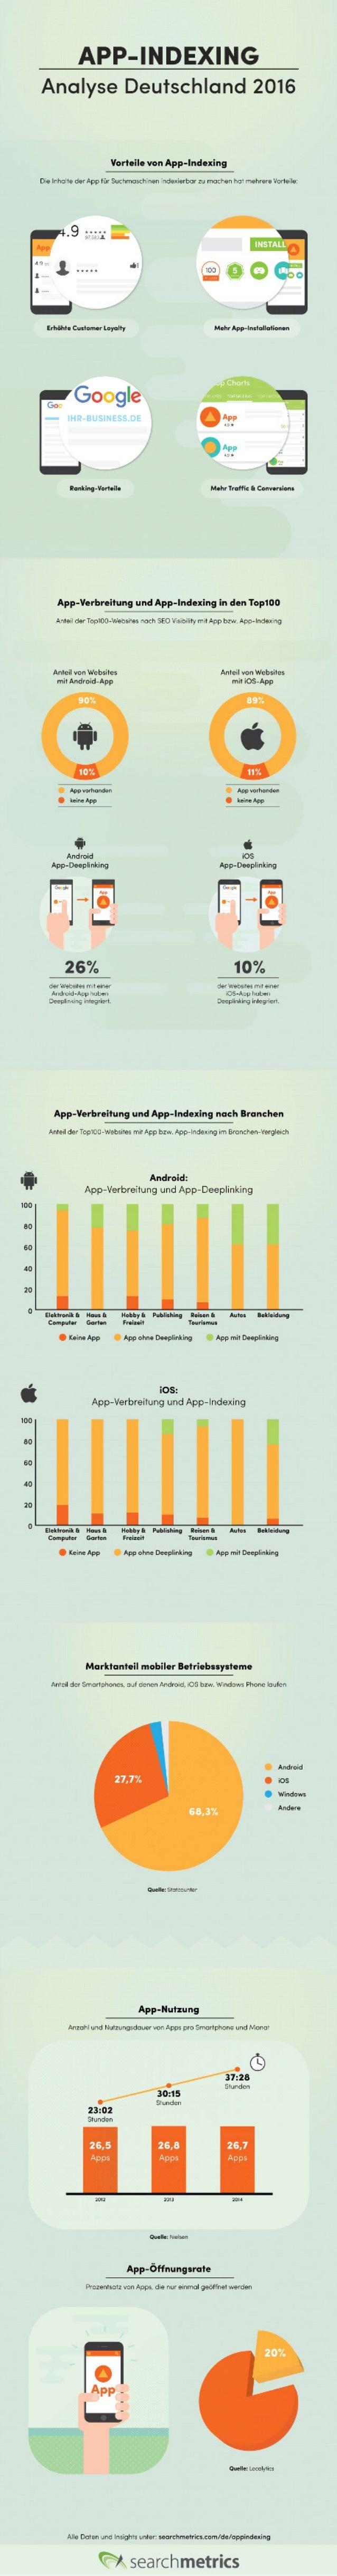 [DE] Infografik: App Indexing